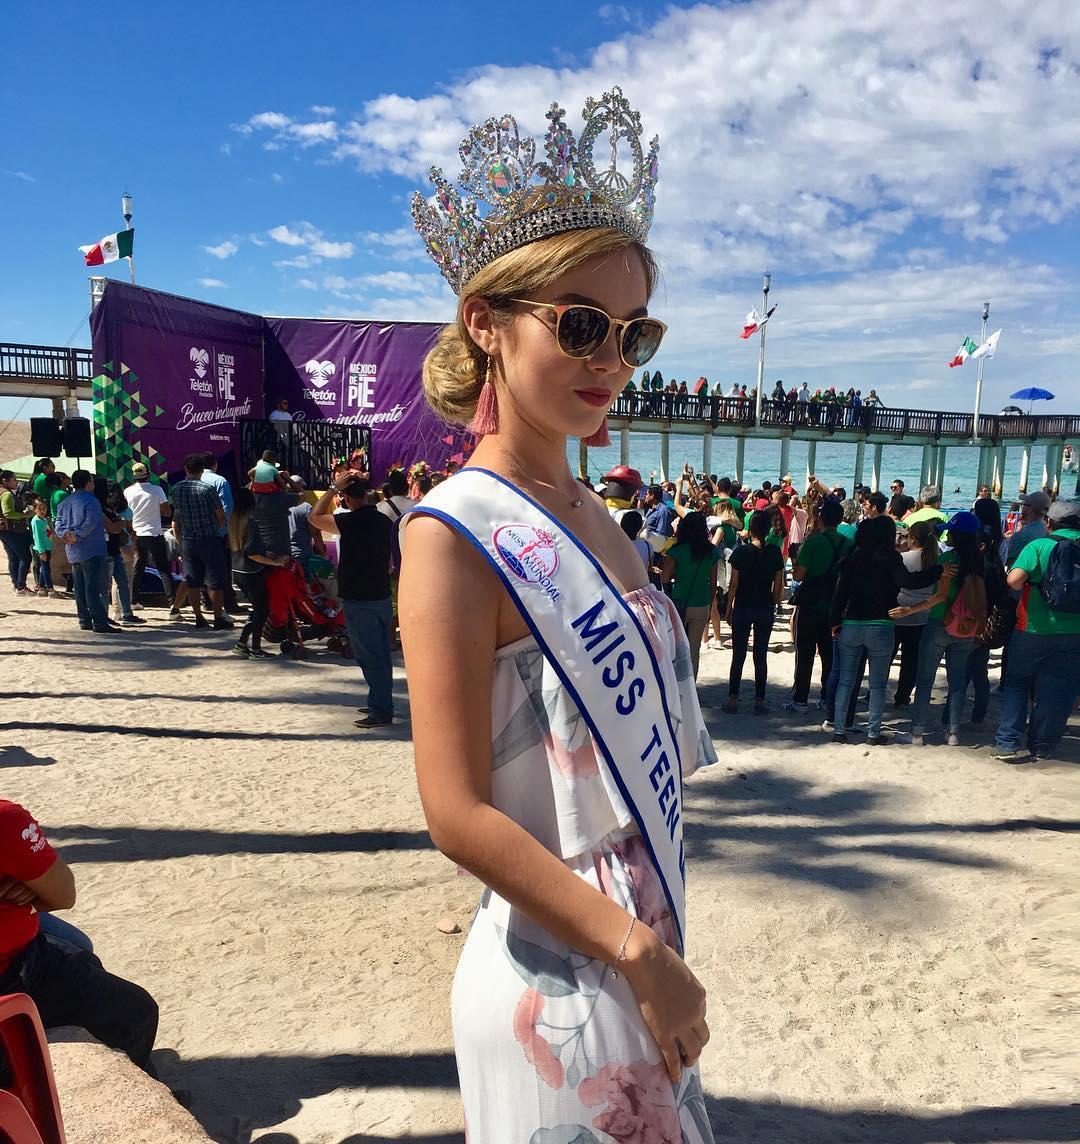 coral chavez, top 6 de miss teen mundial 2018. 28433110